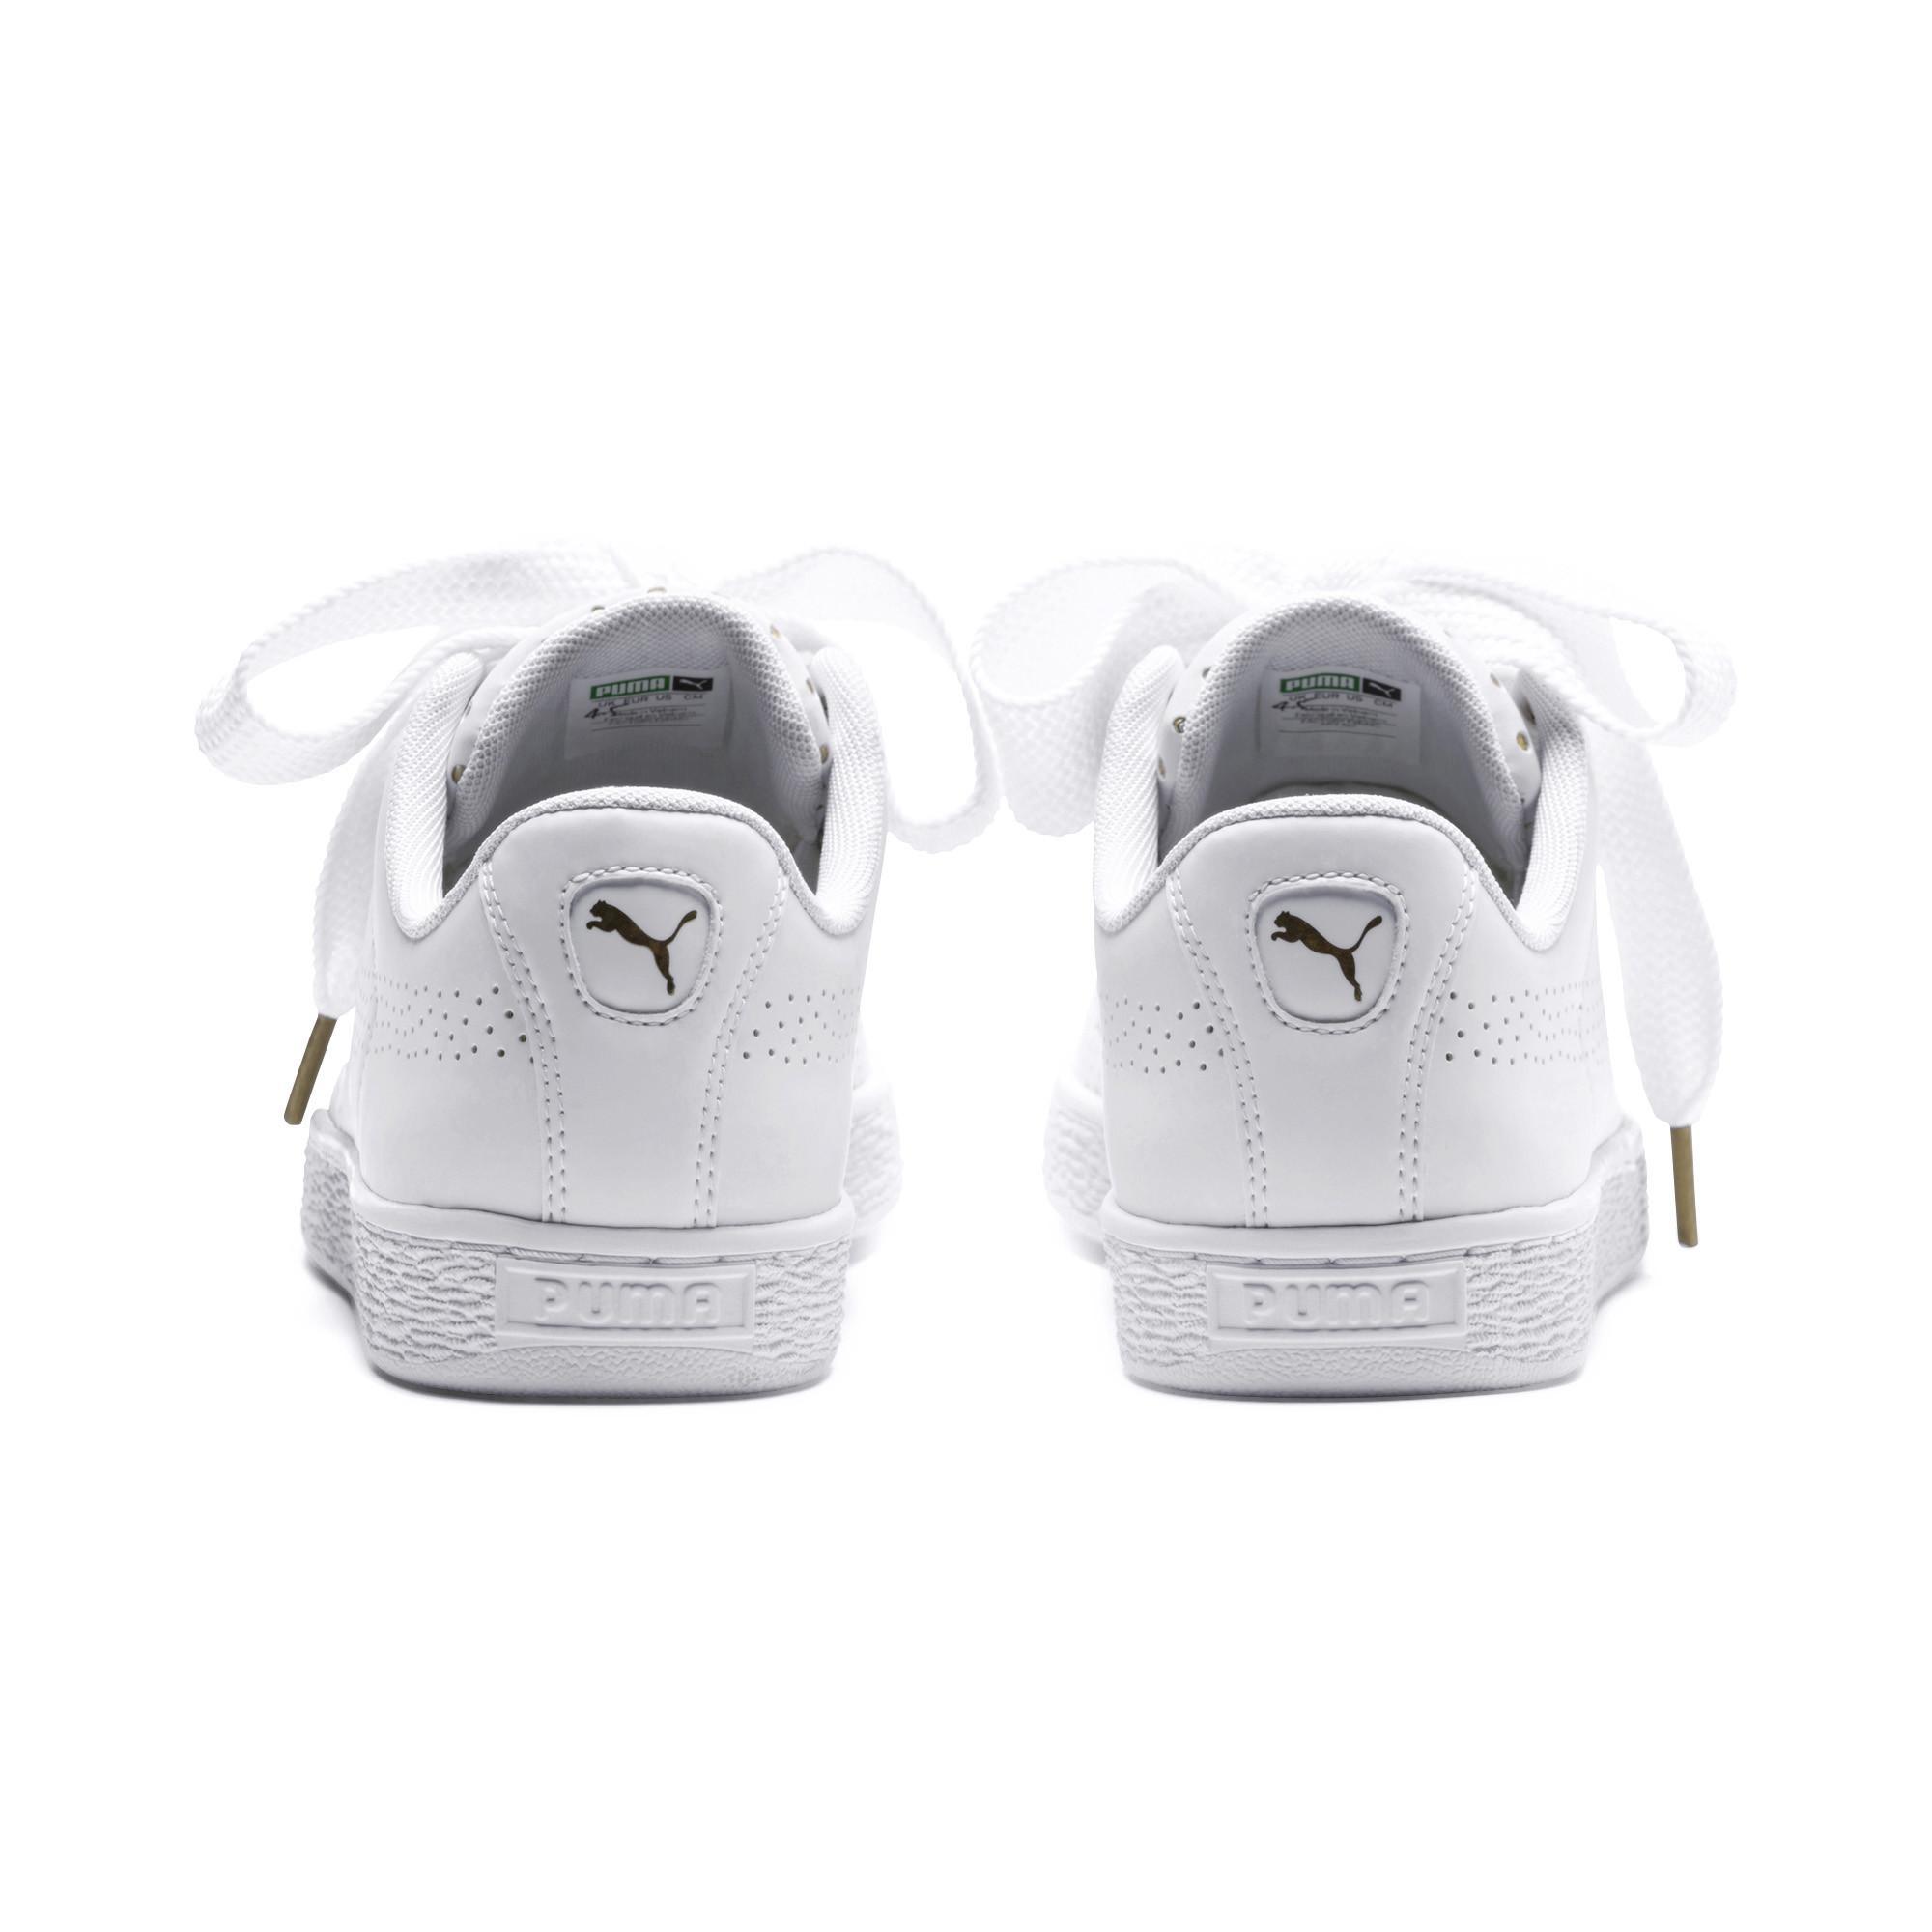 5d09c675f4c6 Gallery. Women s Adidas Prophere Women s Khaki Sneakers ...